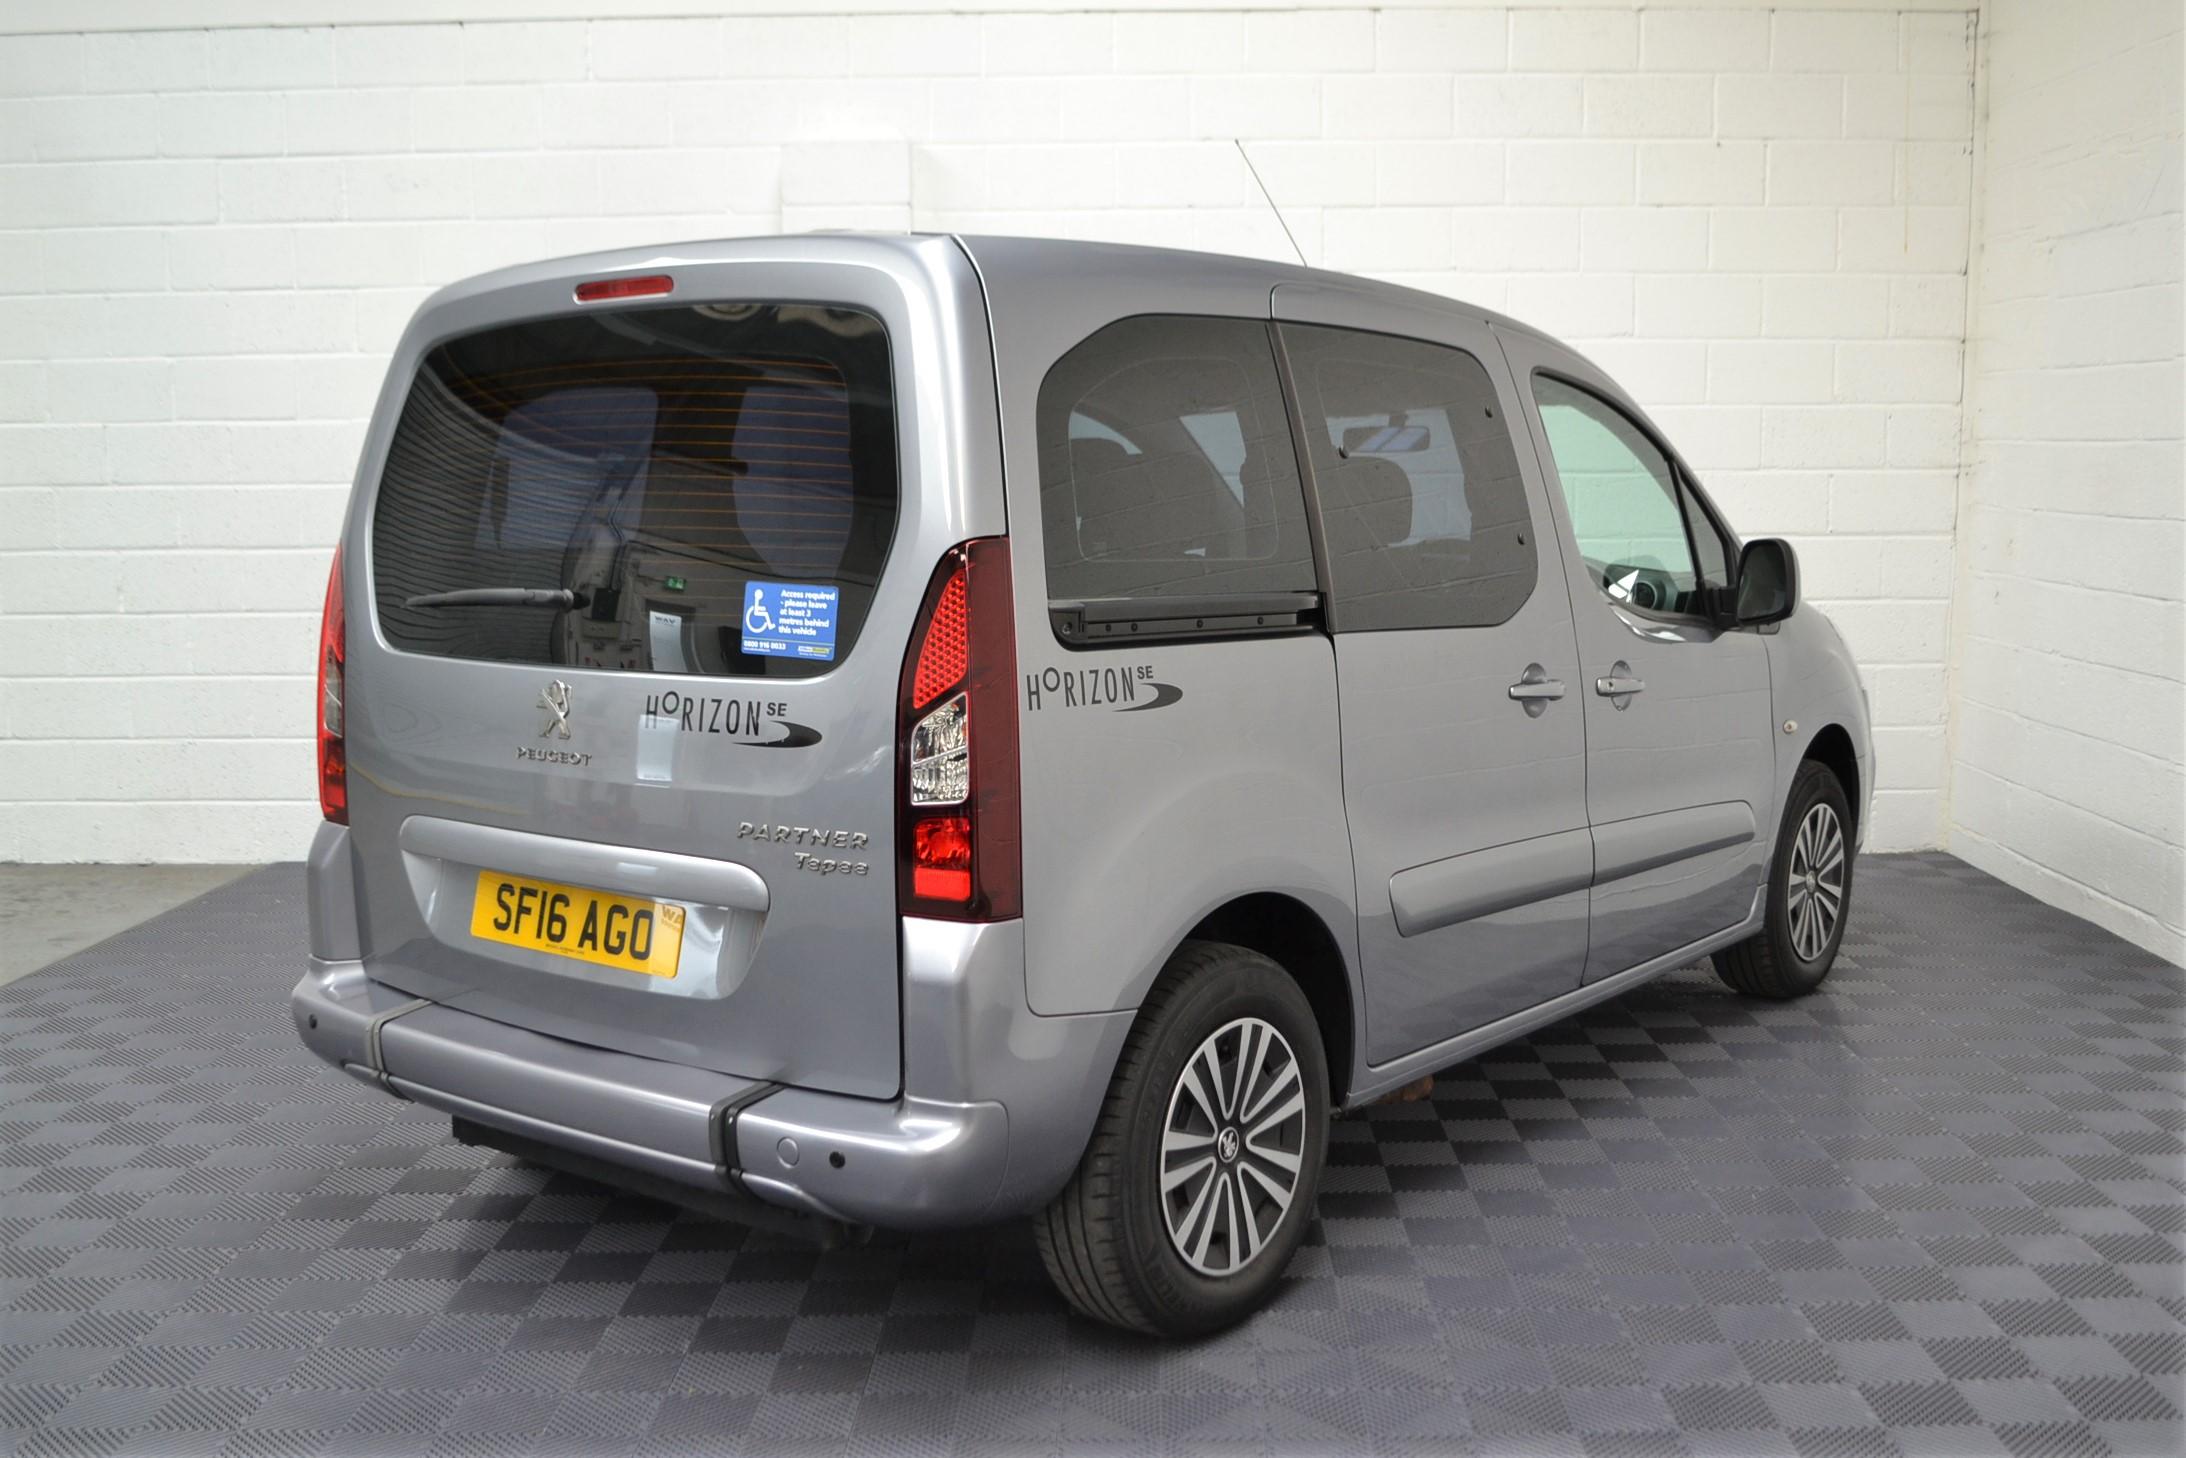 Used Wav Cars for Sale UK Citroen Berlingo WAV Car Peugeot Partner Petrol Wheelchair Accessible Vehicles Buy Sell Bristol Somerset Devon Dorset 5